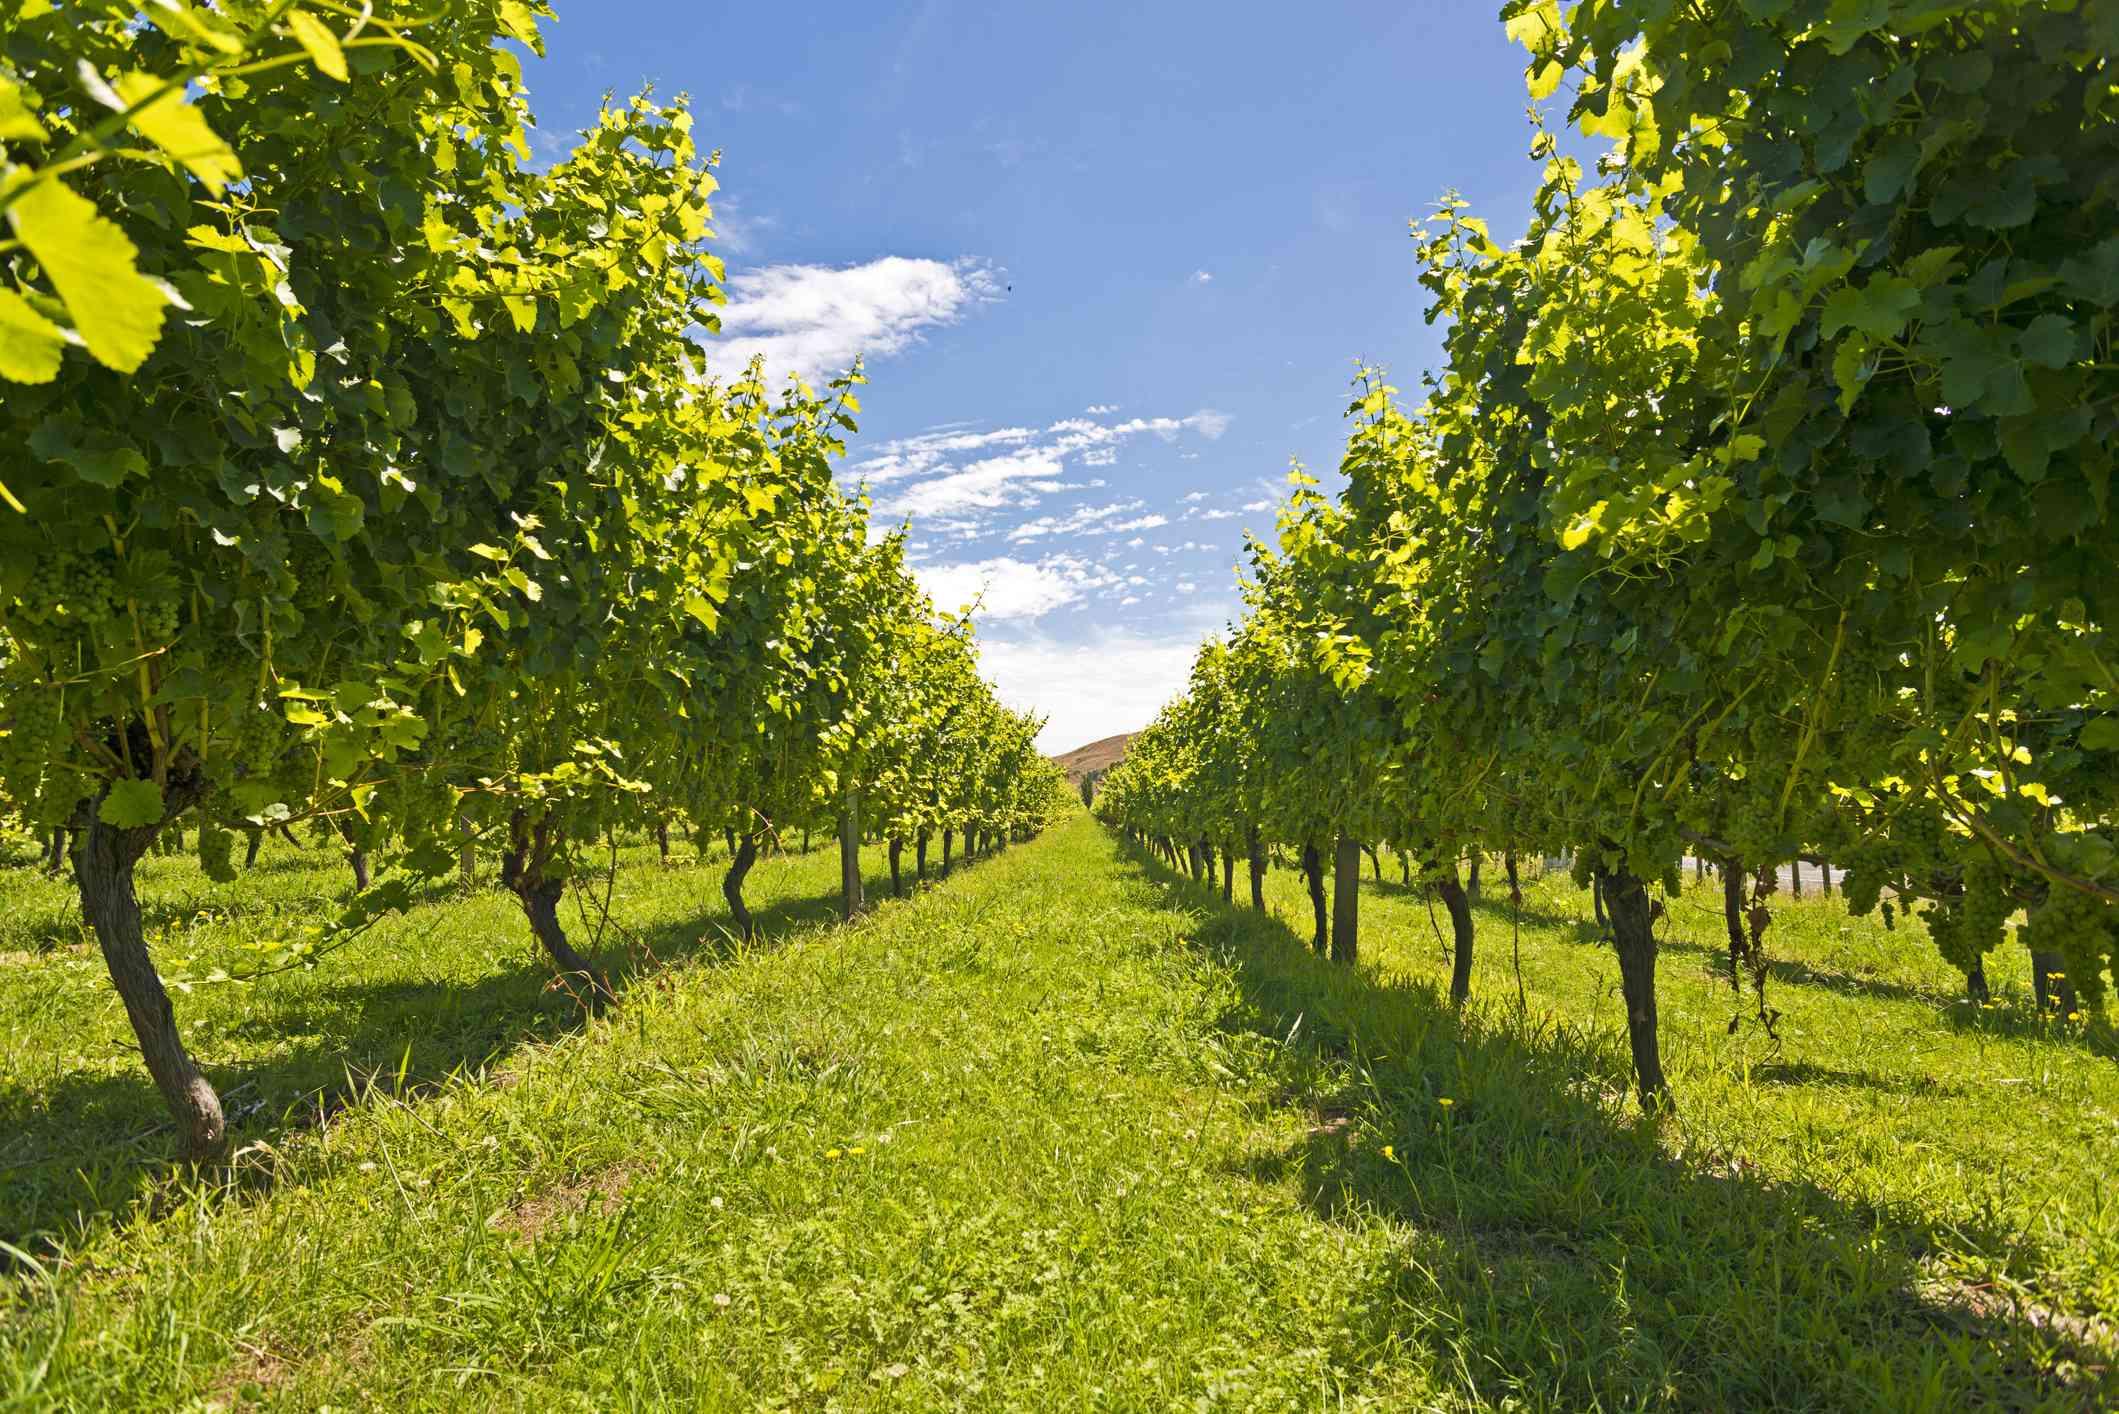 Vines in a vineyard near Gisborne, East Cape, North Island, New Zealand